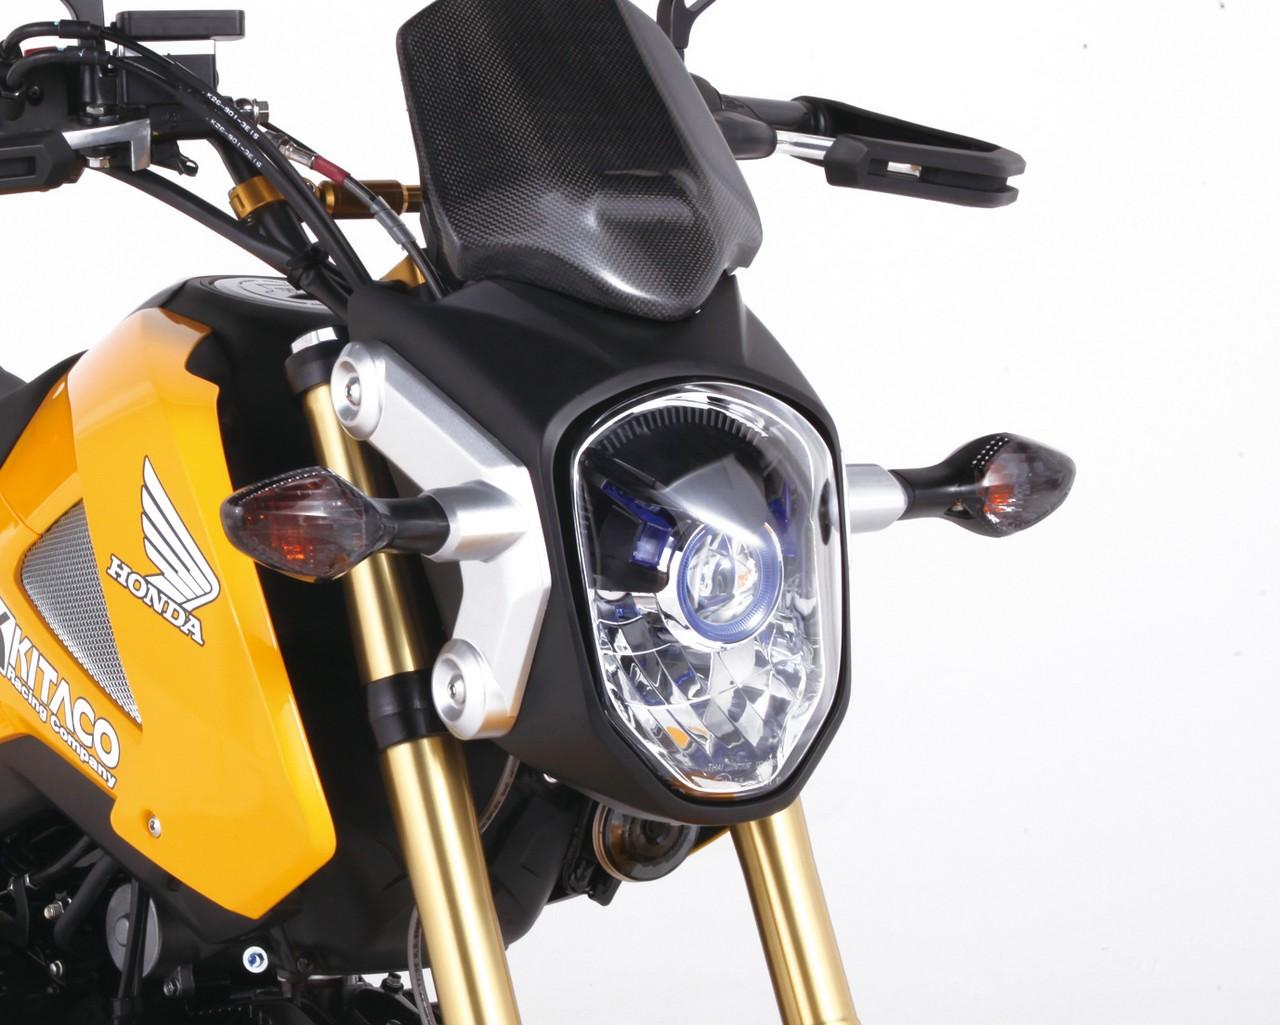 【KITACO】燻黑方向燈殼組 - 「Webike-摩托百貨」